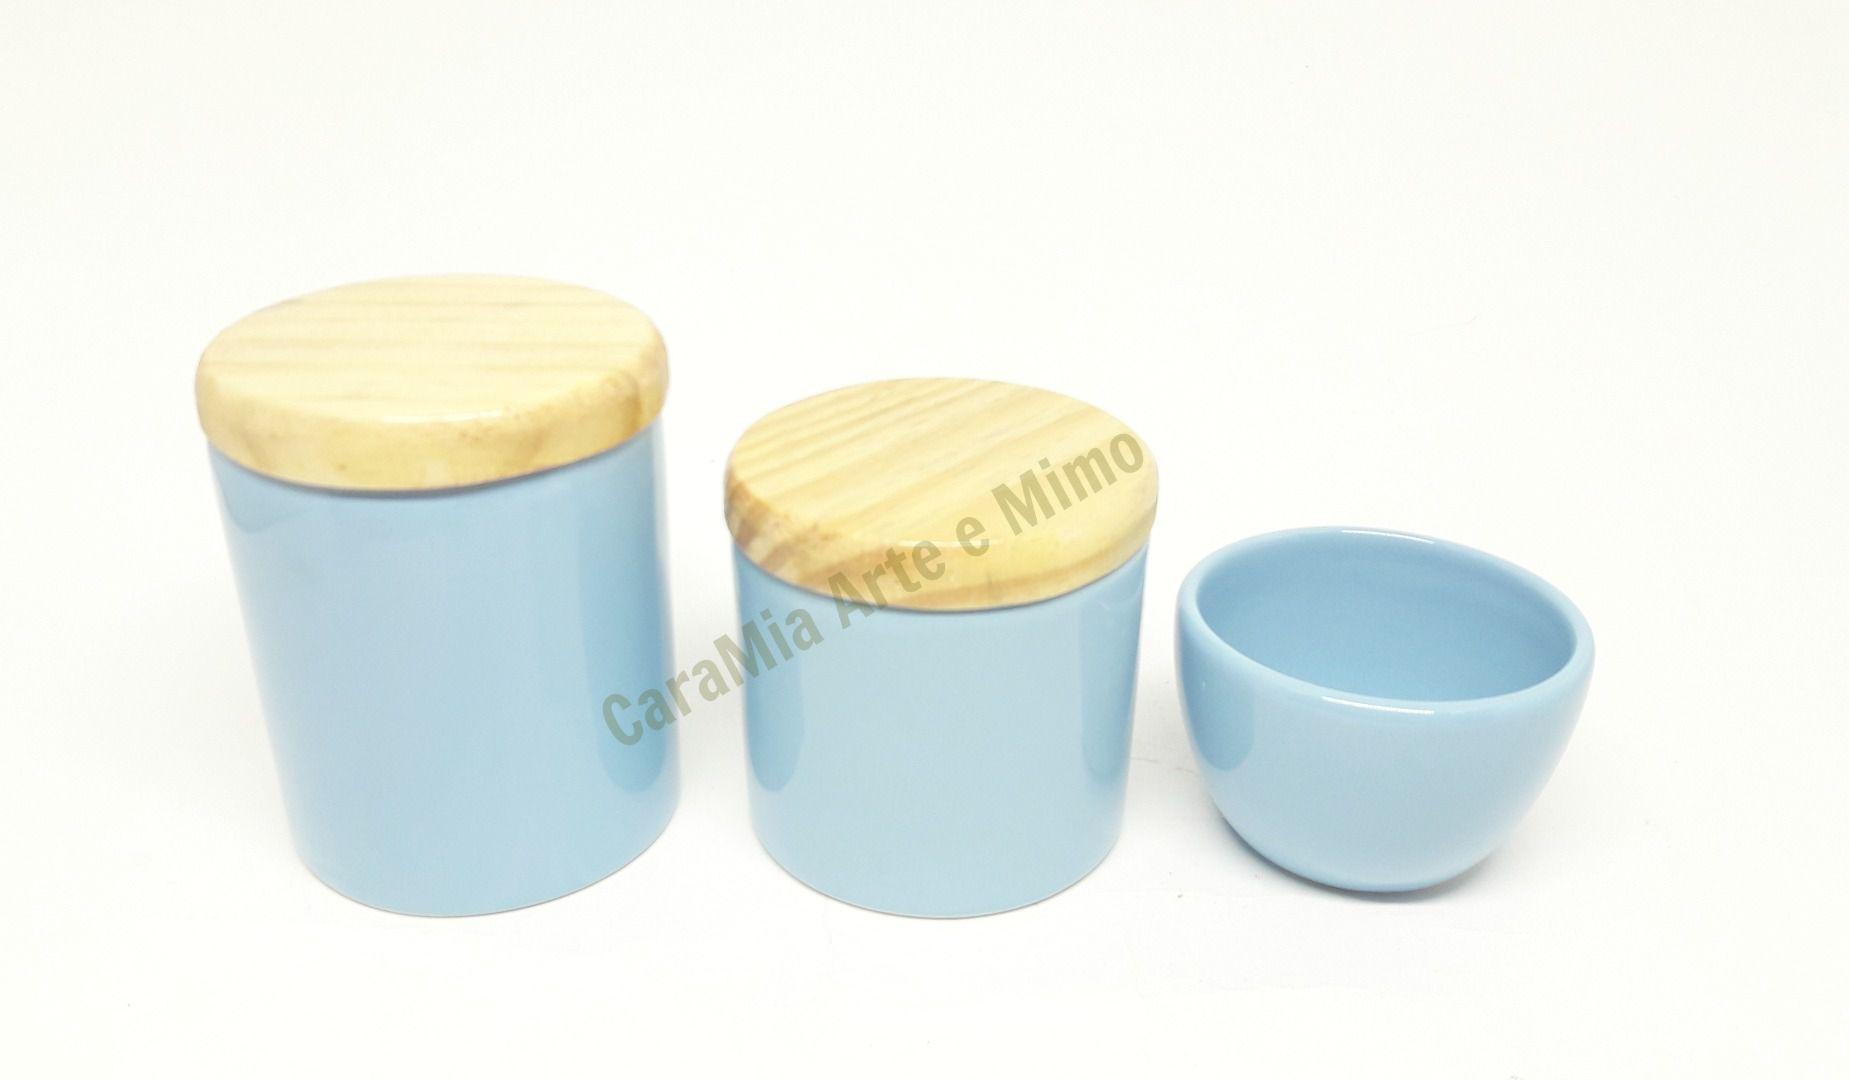 Kit Higiene Bebê Cerâmica | Azul Bebê | Tampas Madeira Pinus Natural